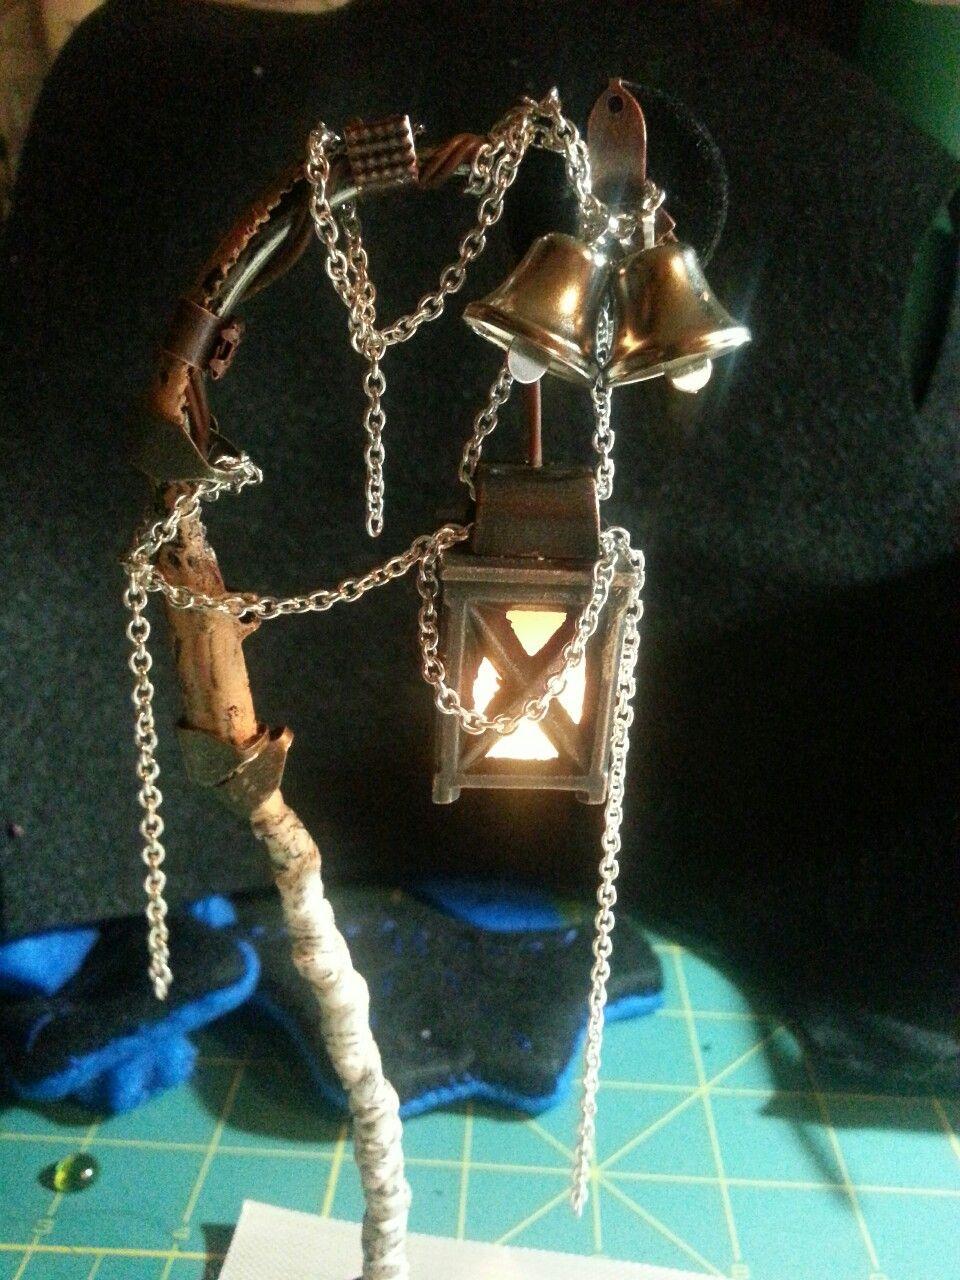 I made a Bloodborne Lantern!